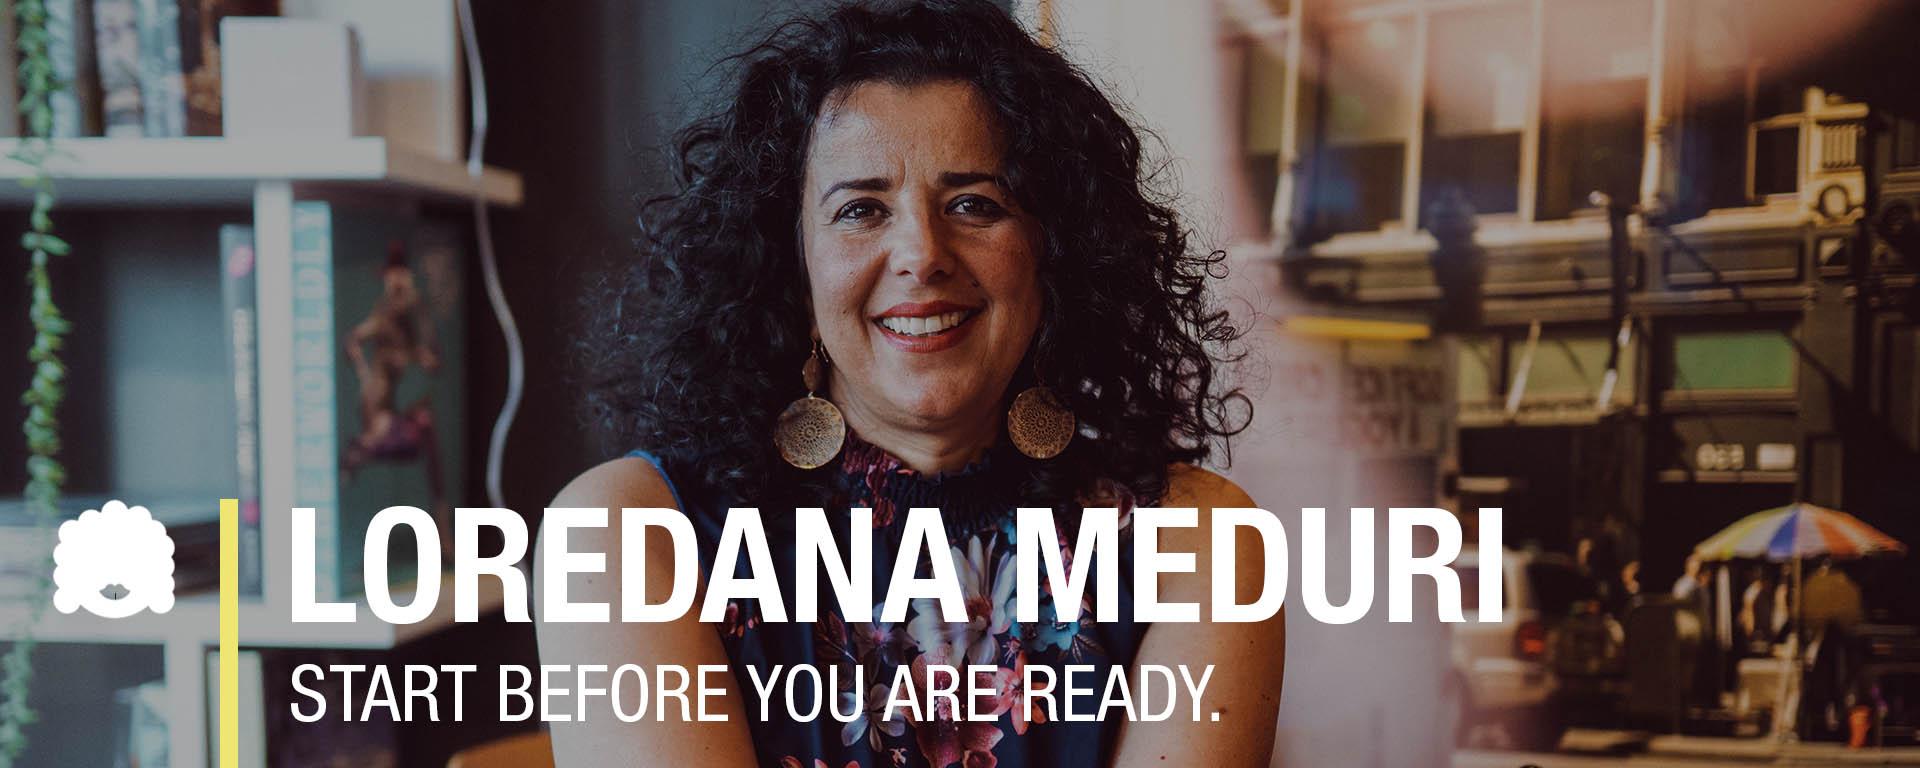 Coach for Leadership, Change, Communication | Loredana Meduri